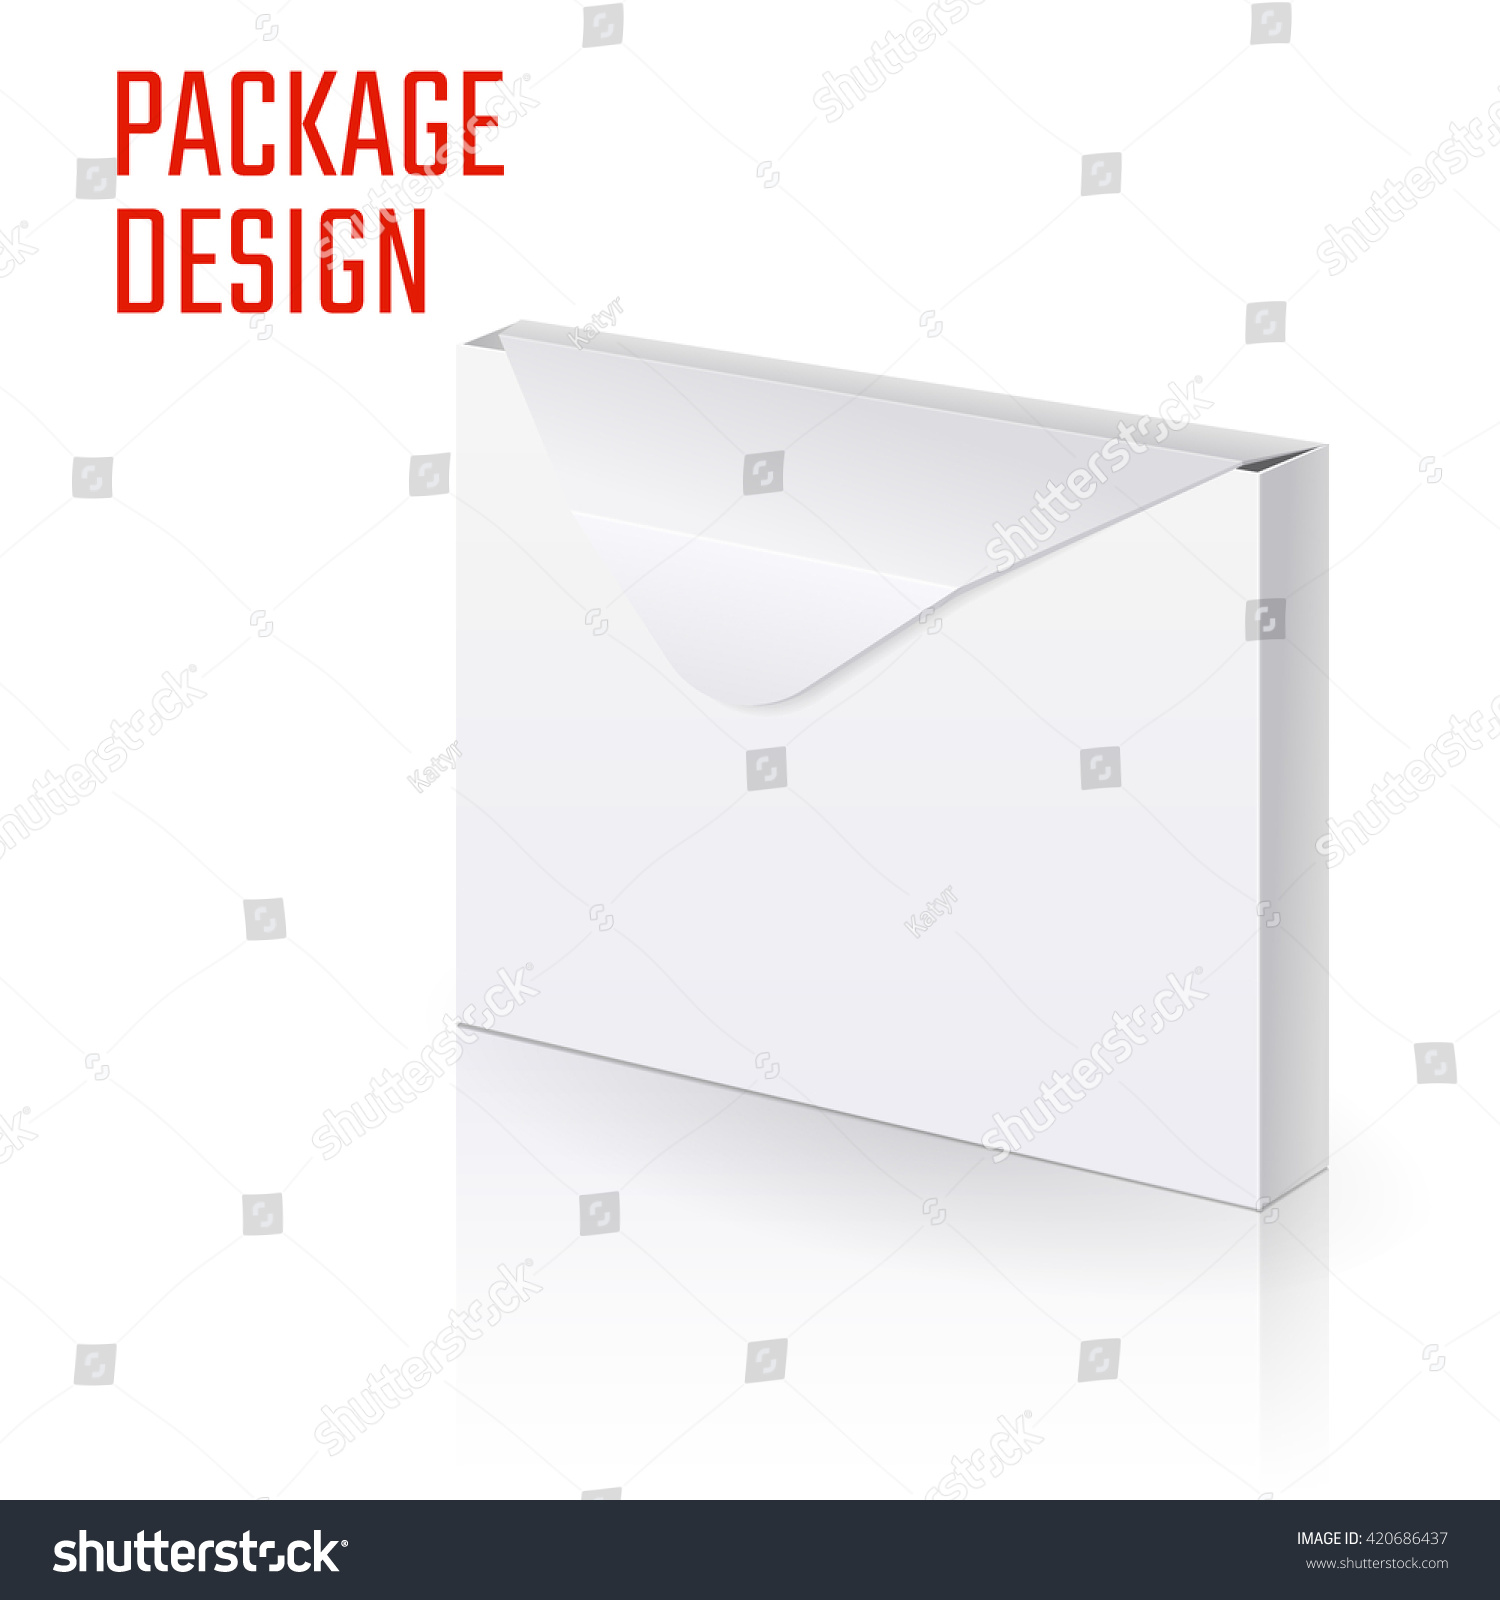 Vector illustration envelope paper craft box stock vector vector illustration of envelope paper or craft box for design website background banner jeuxipadfo Gallery